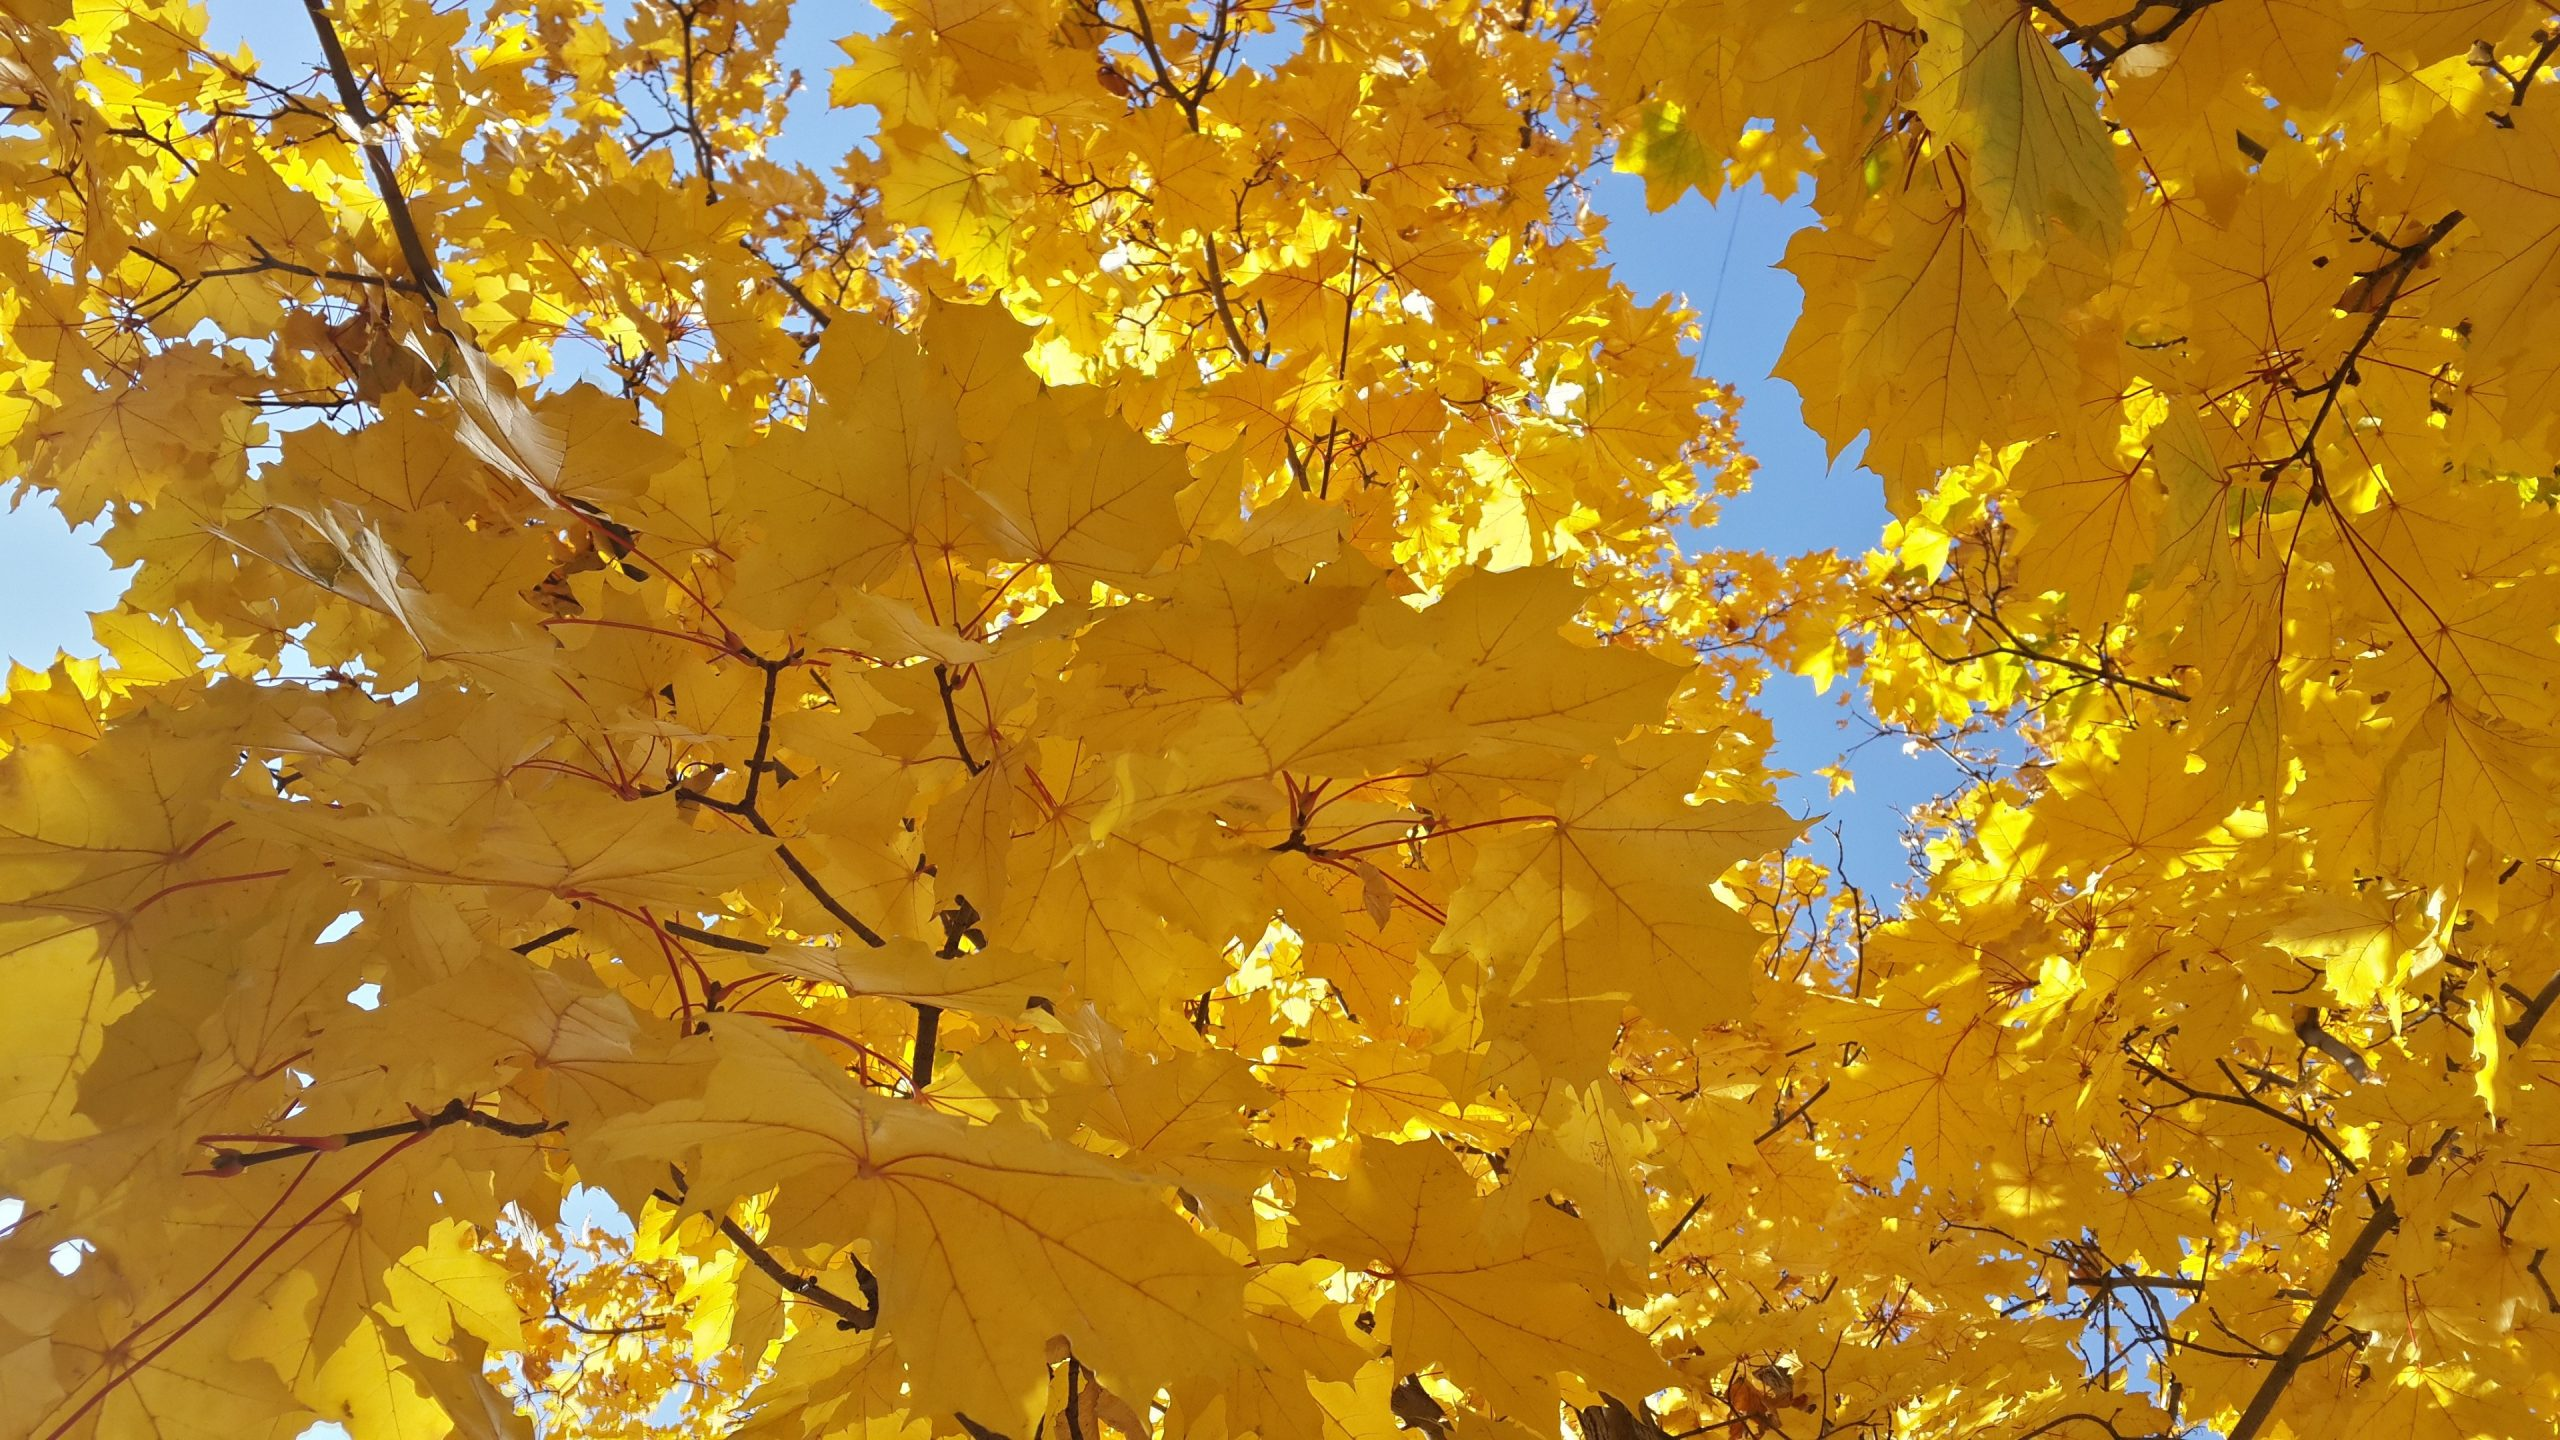 Fall Leaf Wallpaper For Mobile Yellow Leaves Wallpaper 4k Background Hd Wallpaper